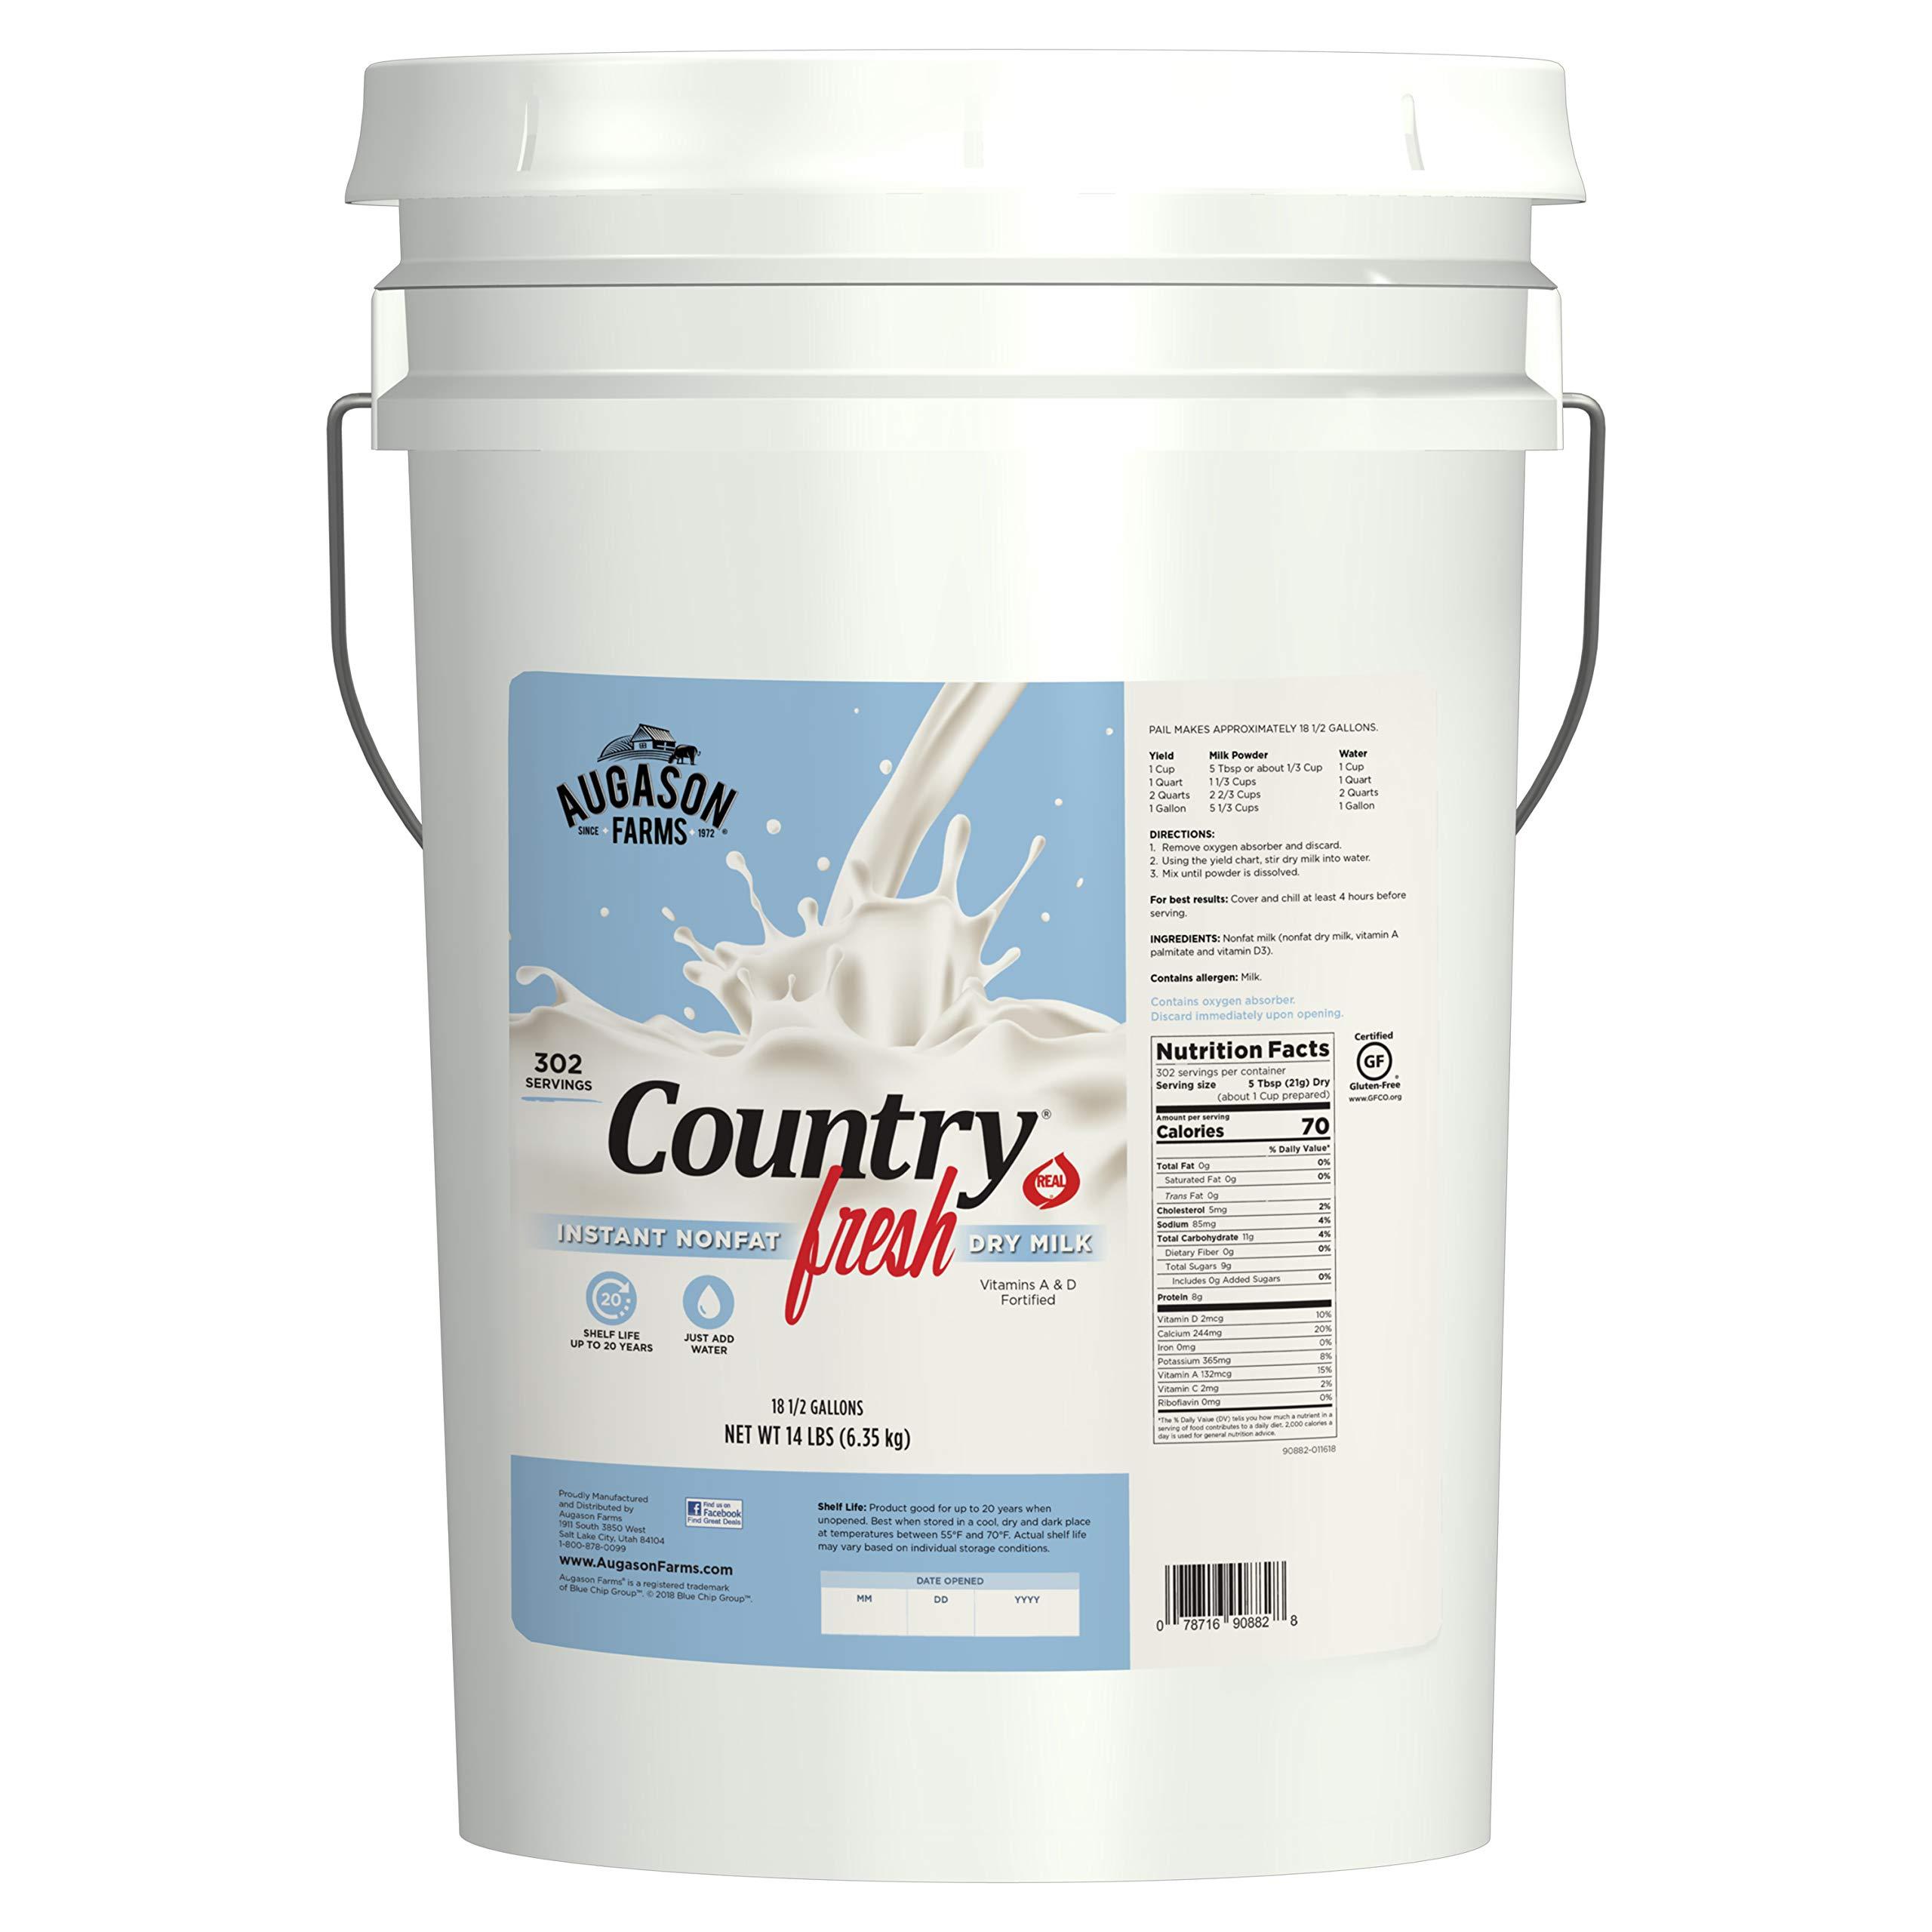 Augason Farms Country Fresh 100% Real Instant Nonfat Dry Milk Emergency Food Storage 14 Pound Pail by Augason Farms